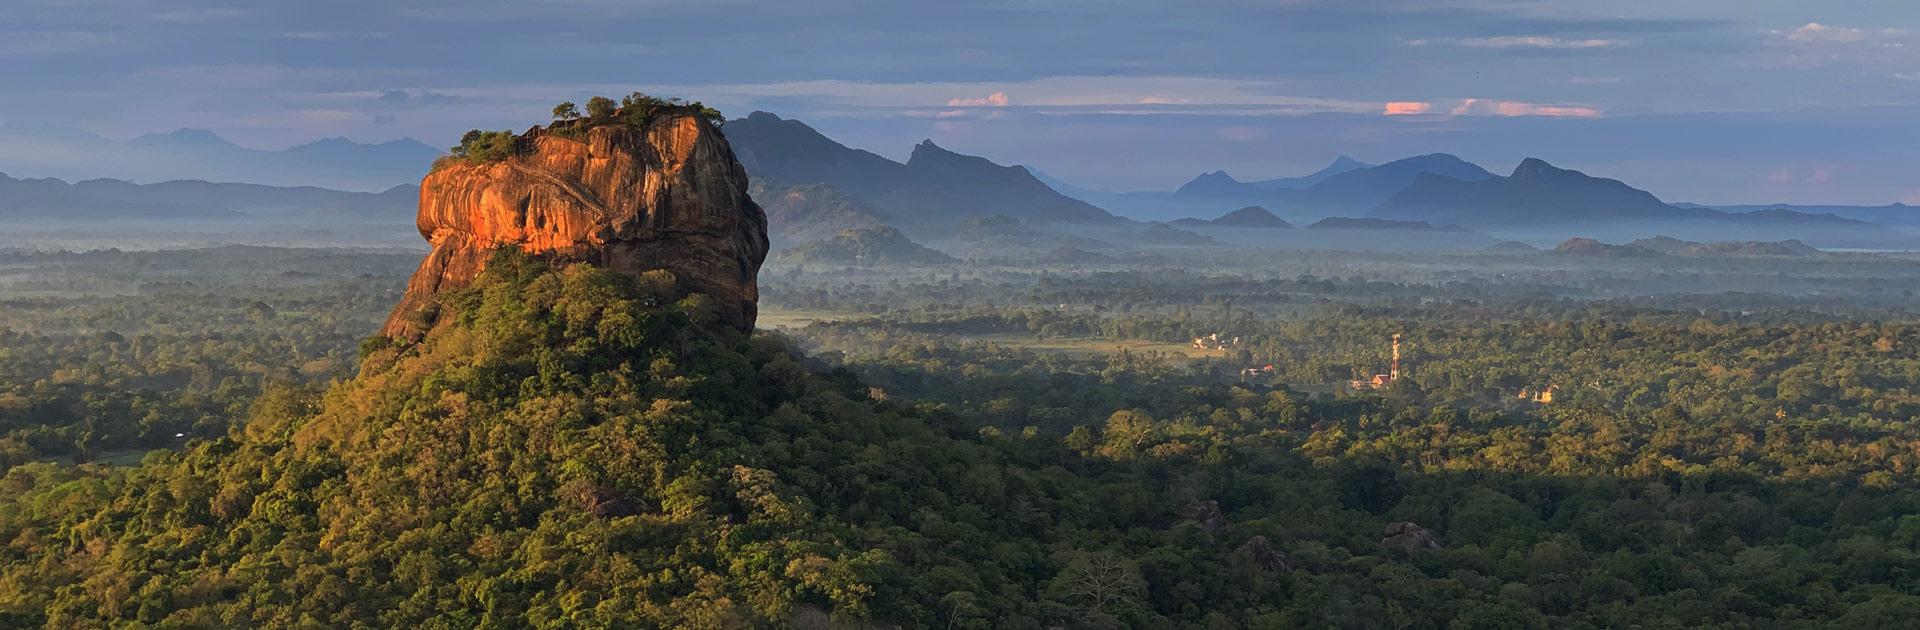 LK Explore Sri Lanka 9 días 1 1